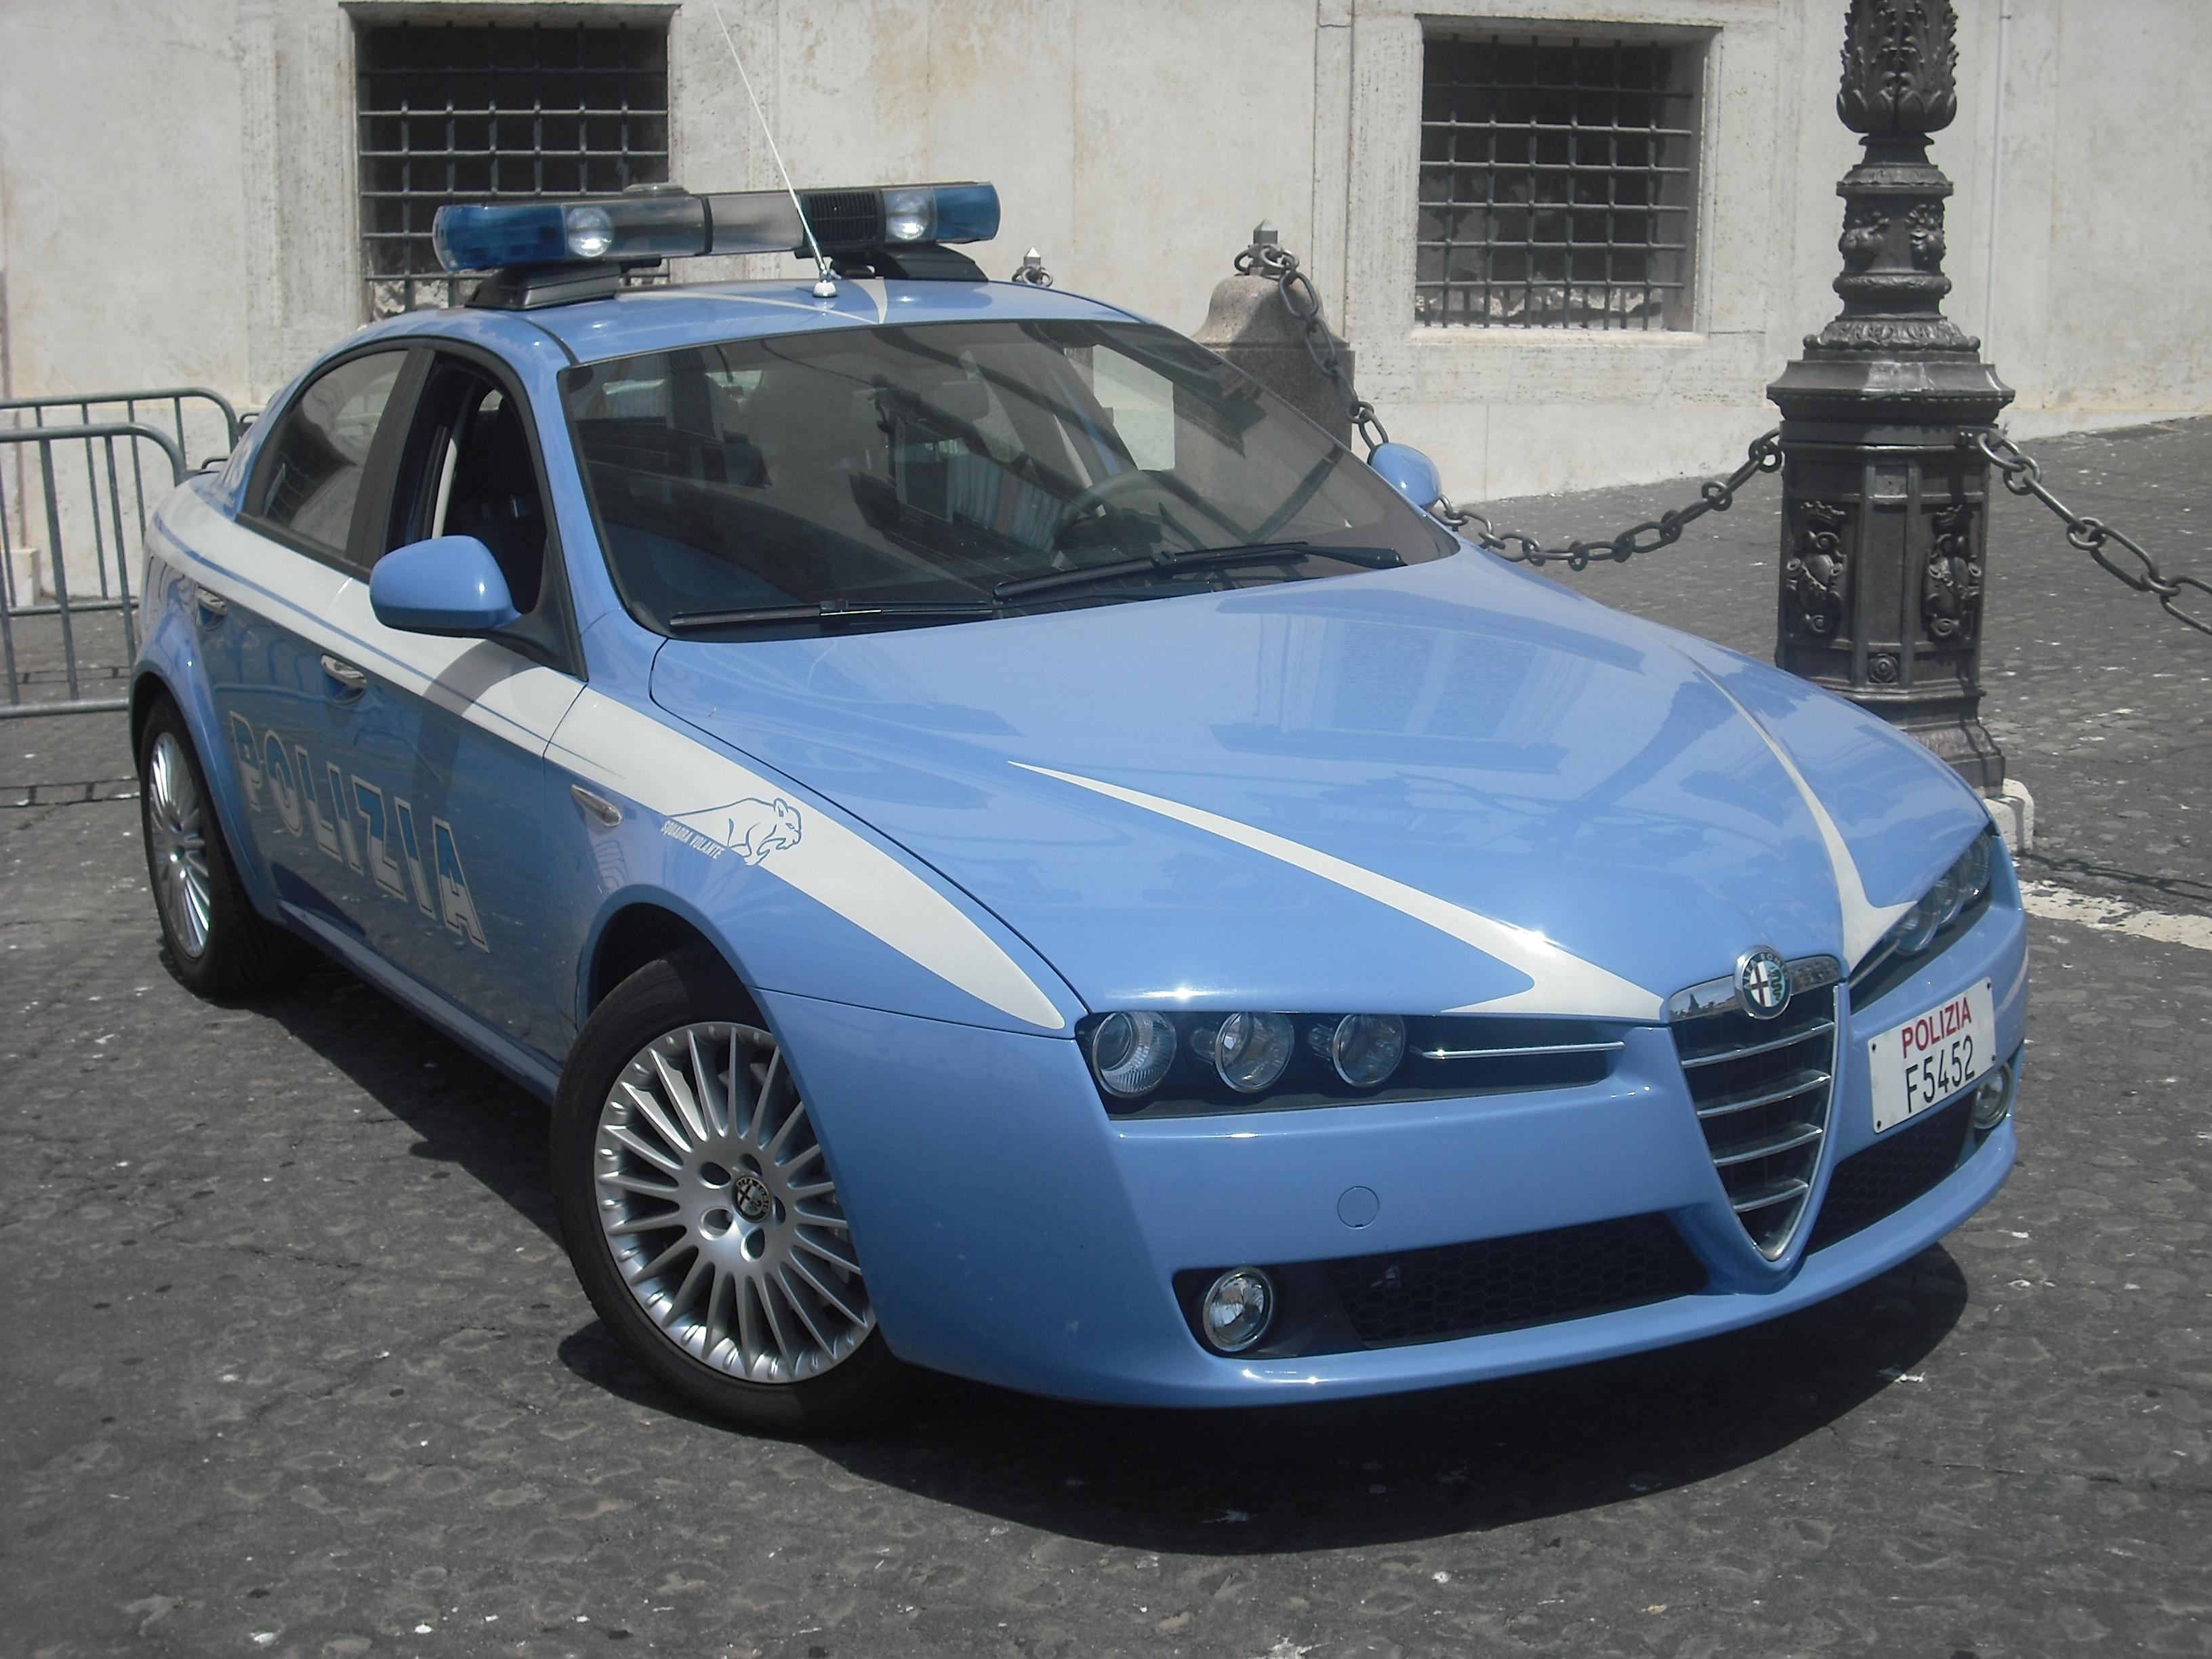 Rome Police Department >> File:Alfa 159 cop.jpg - Wikimedia Commons